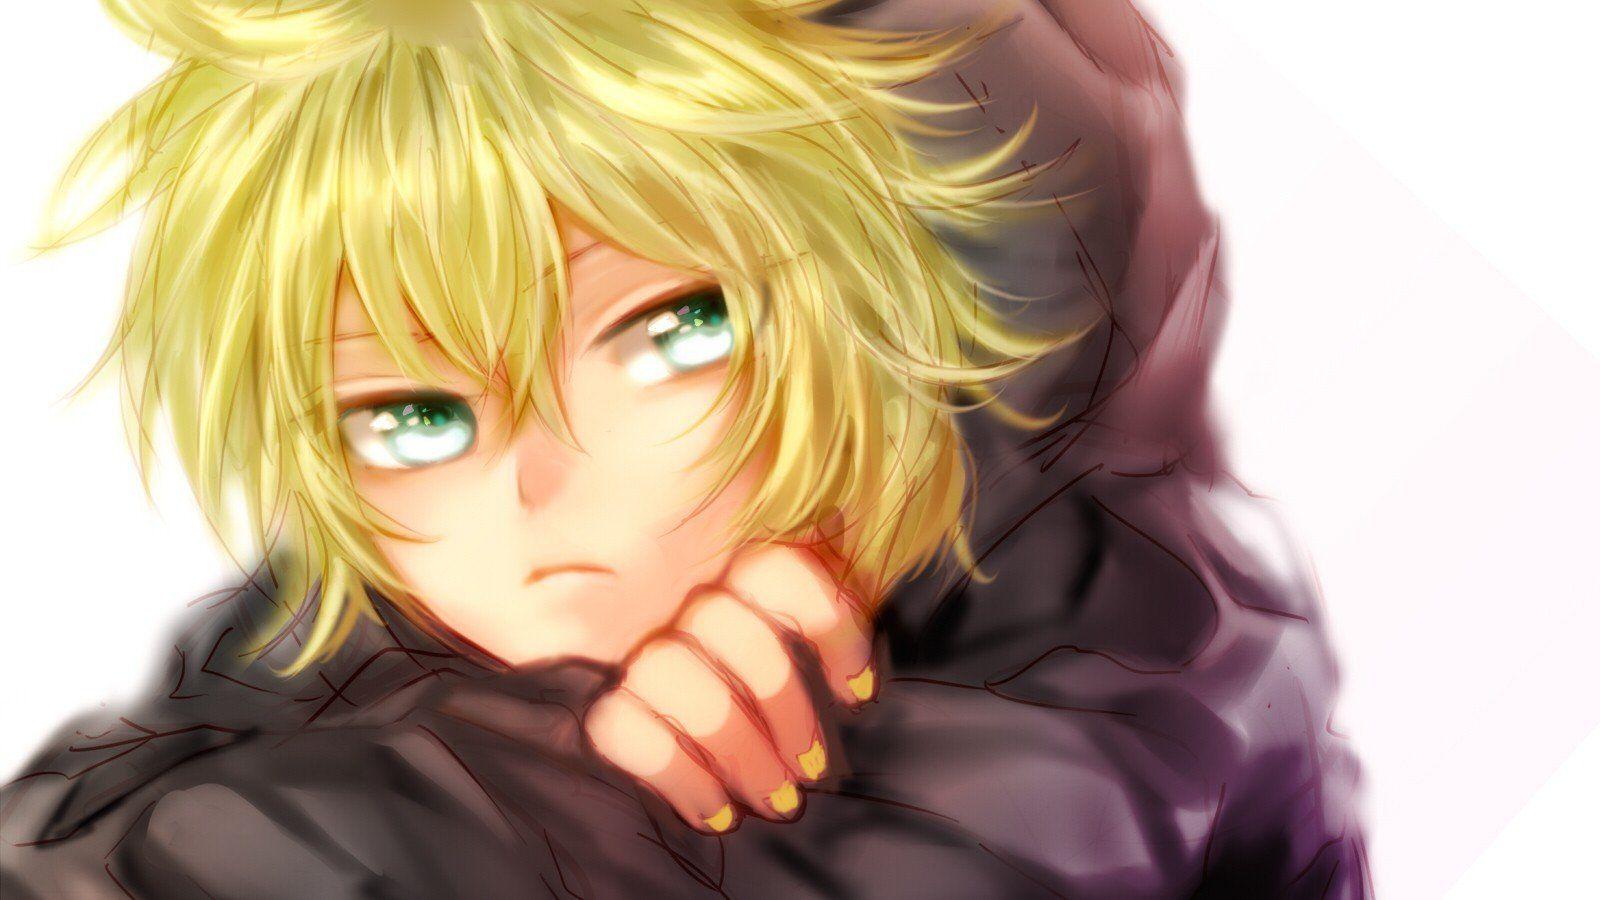 Vocaloid Kagamine Len Green Eyes Anime Boys Wallpaper 1600x900 249197 Wallpaperup Blonde Hair Green Eyes Blonde Hair Blue Eyes Green Eyes